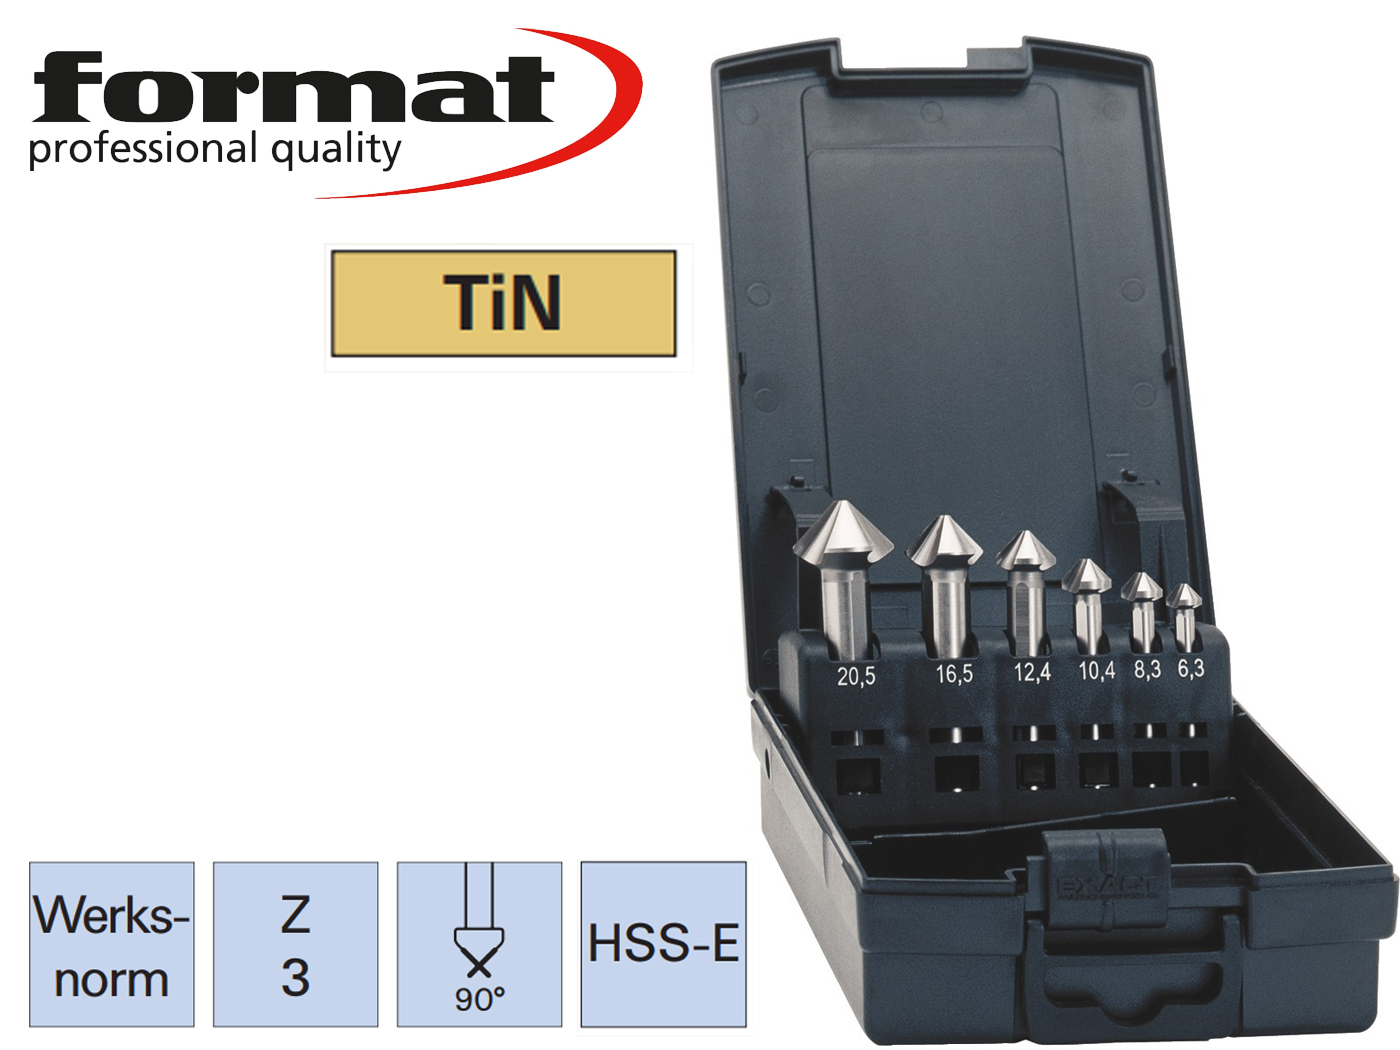 verzinkboor set DIN 335C HSS E TiN ADVANCED exact   DKMTools - DKM Tools